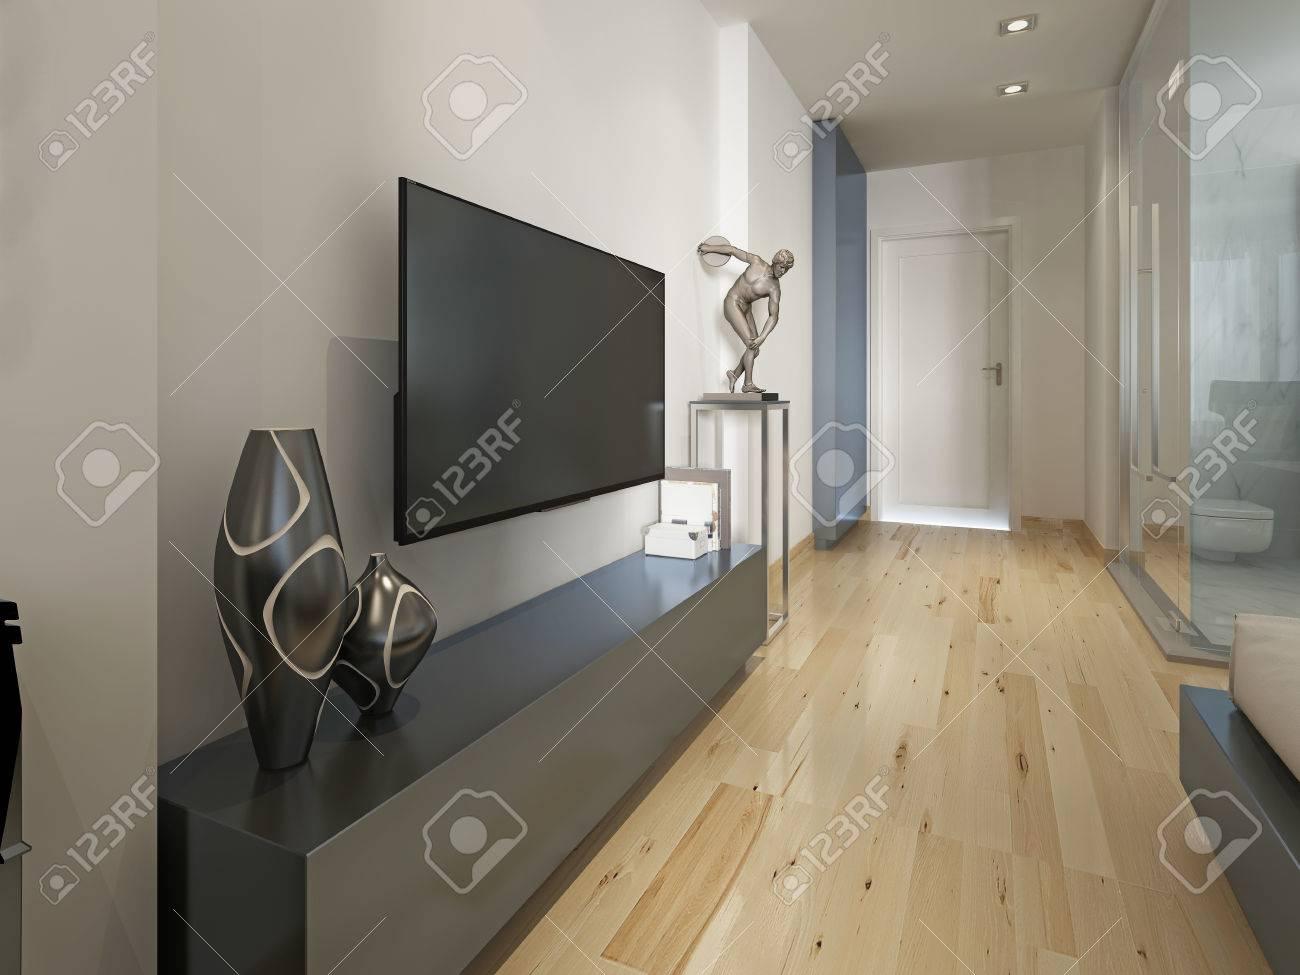 Meuble Tv Moderne Avec La Figurine Décor Salon Moderne Rendu 3d